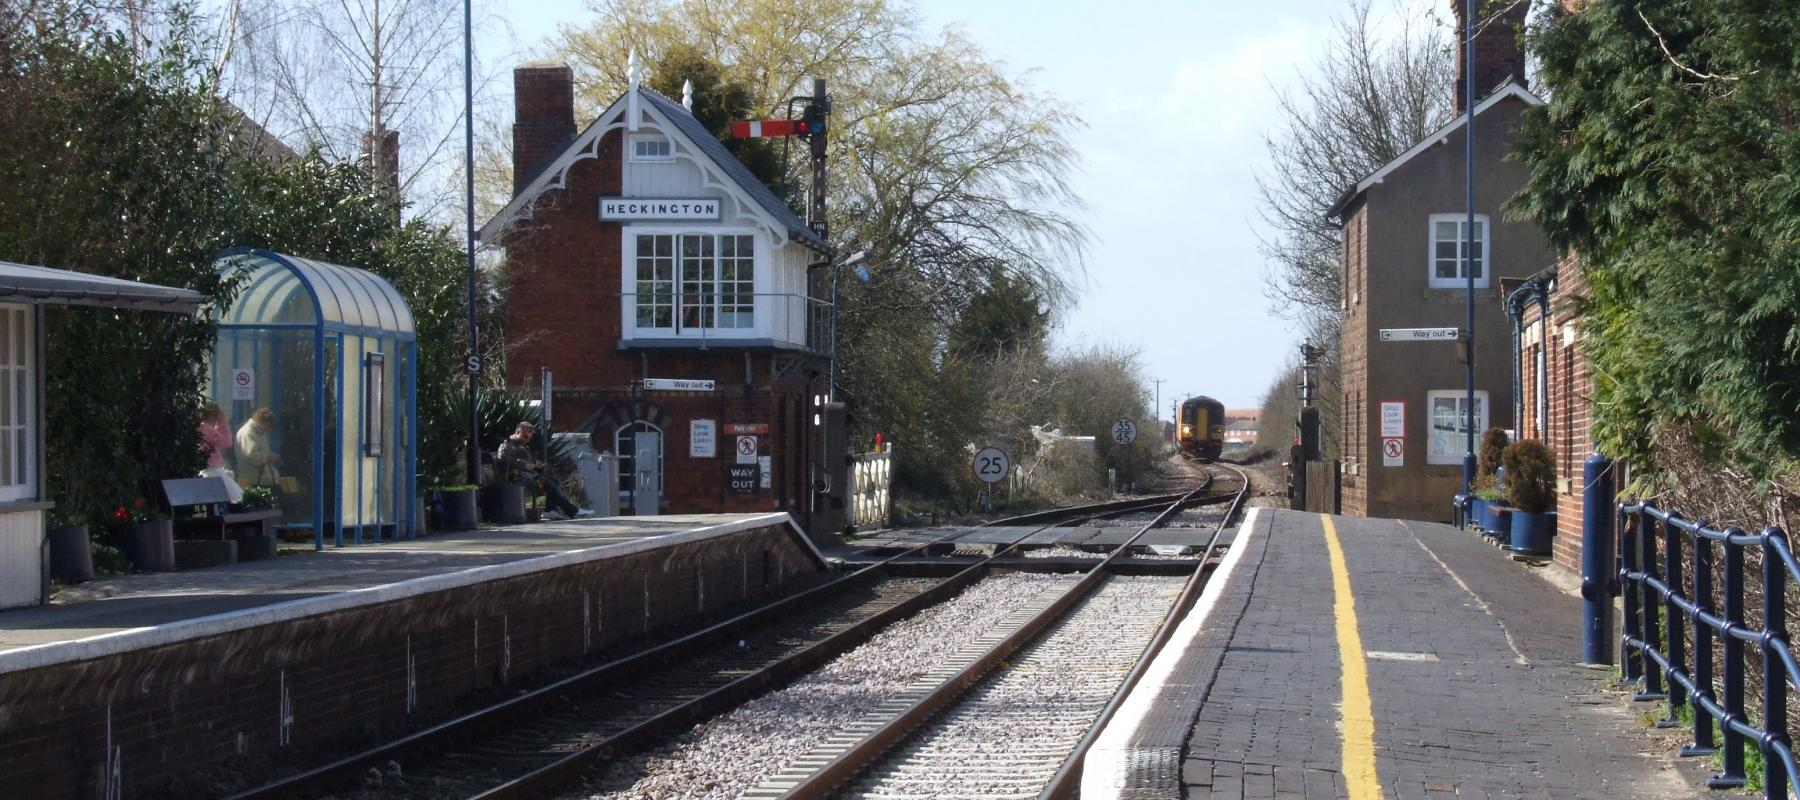 Heckington Railway Station along the Poacher Line. Midlands UK.